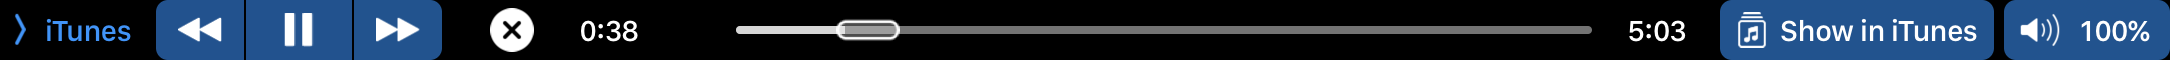 iTunes%20Control%202